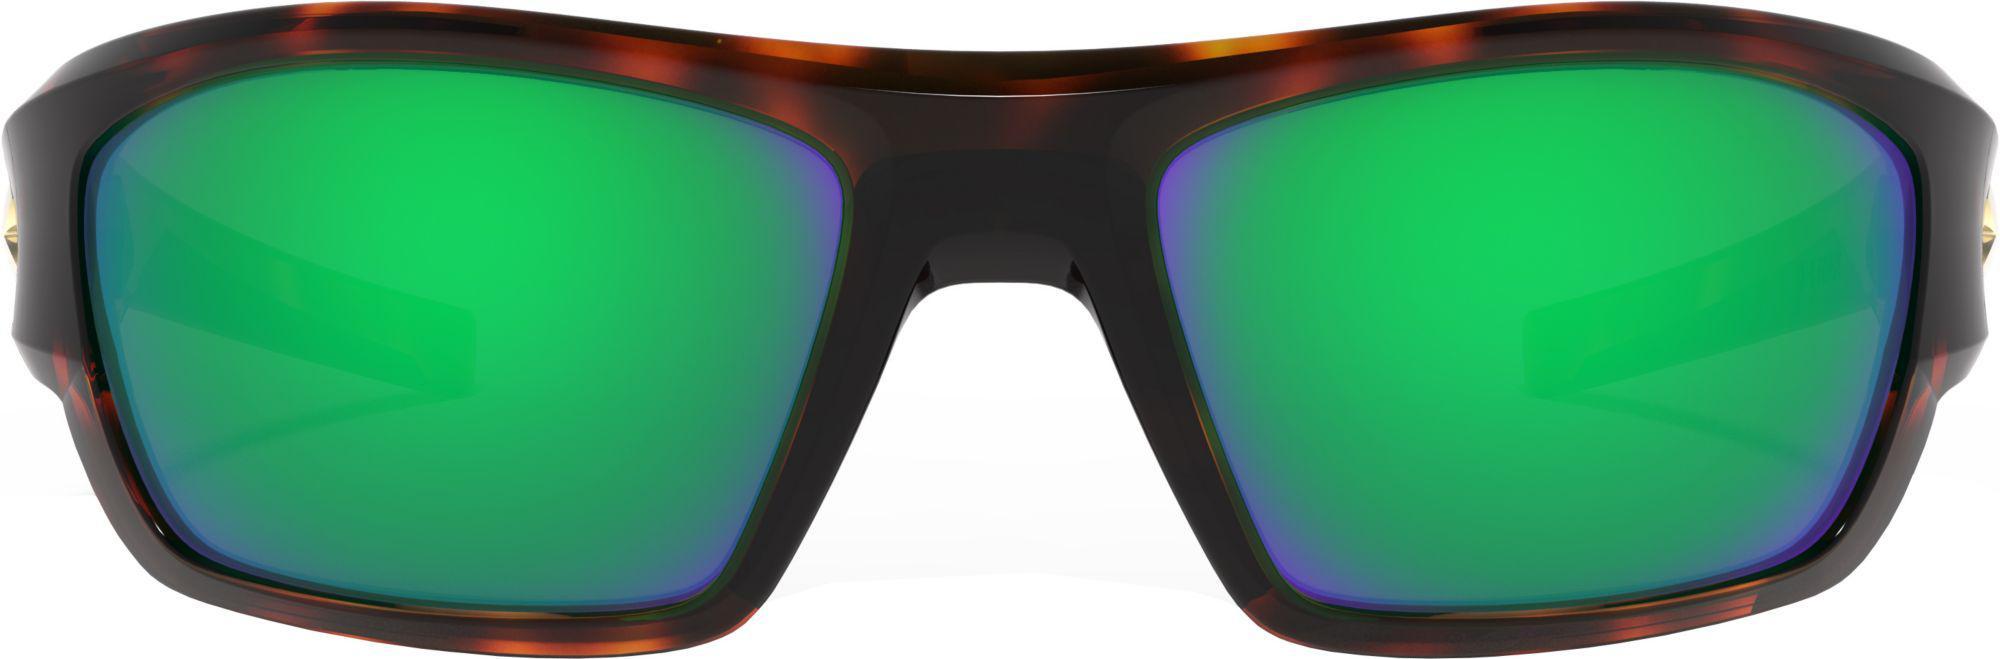 43fb513efcba Under Armour - Multicolor Force Storm Polarized Sunglasses - Lyst